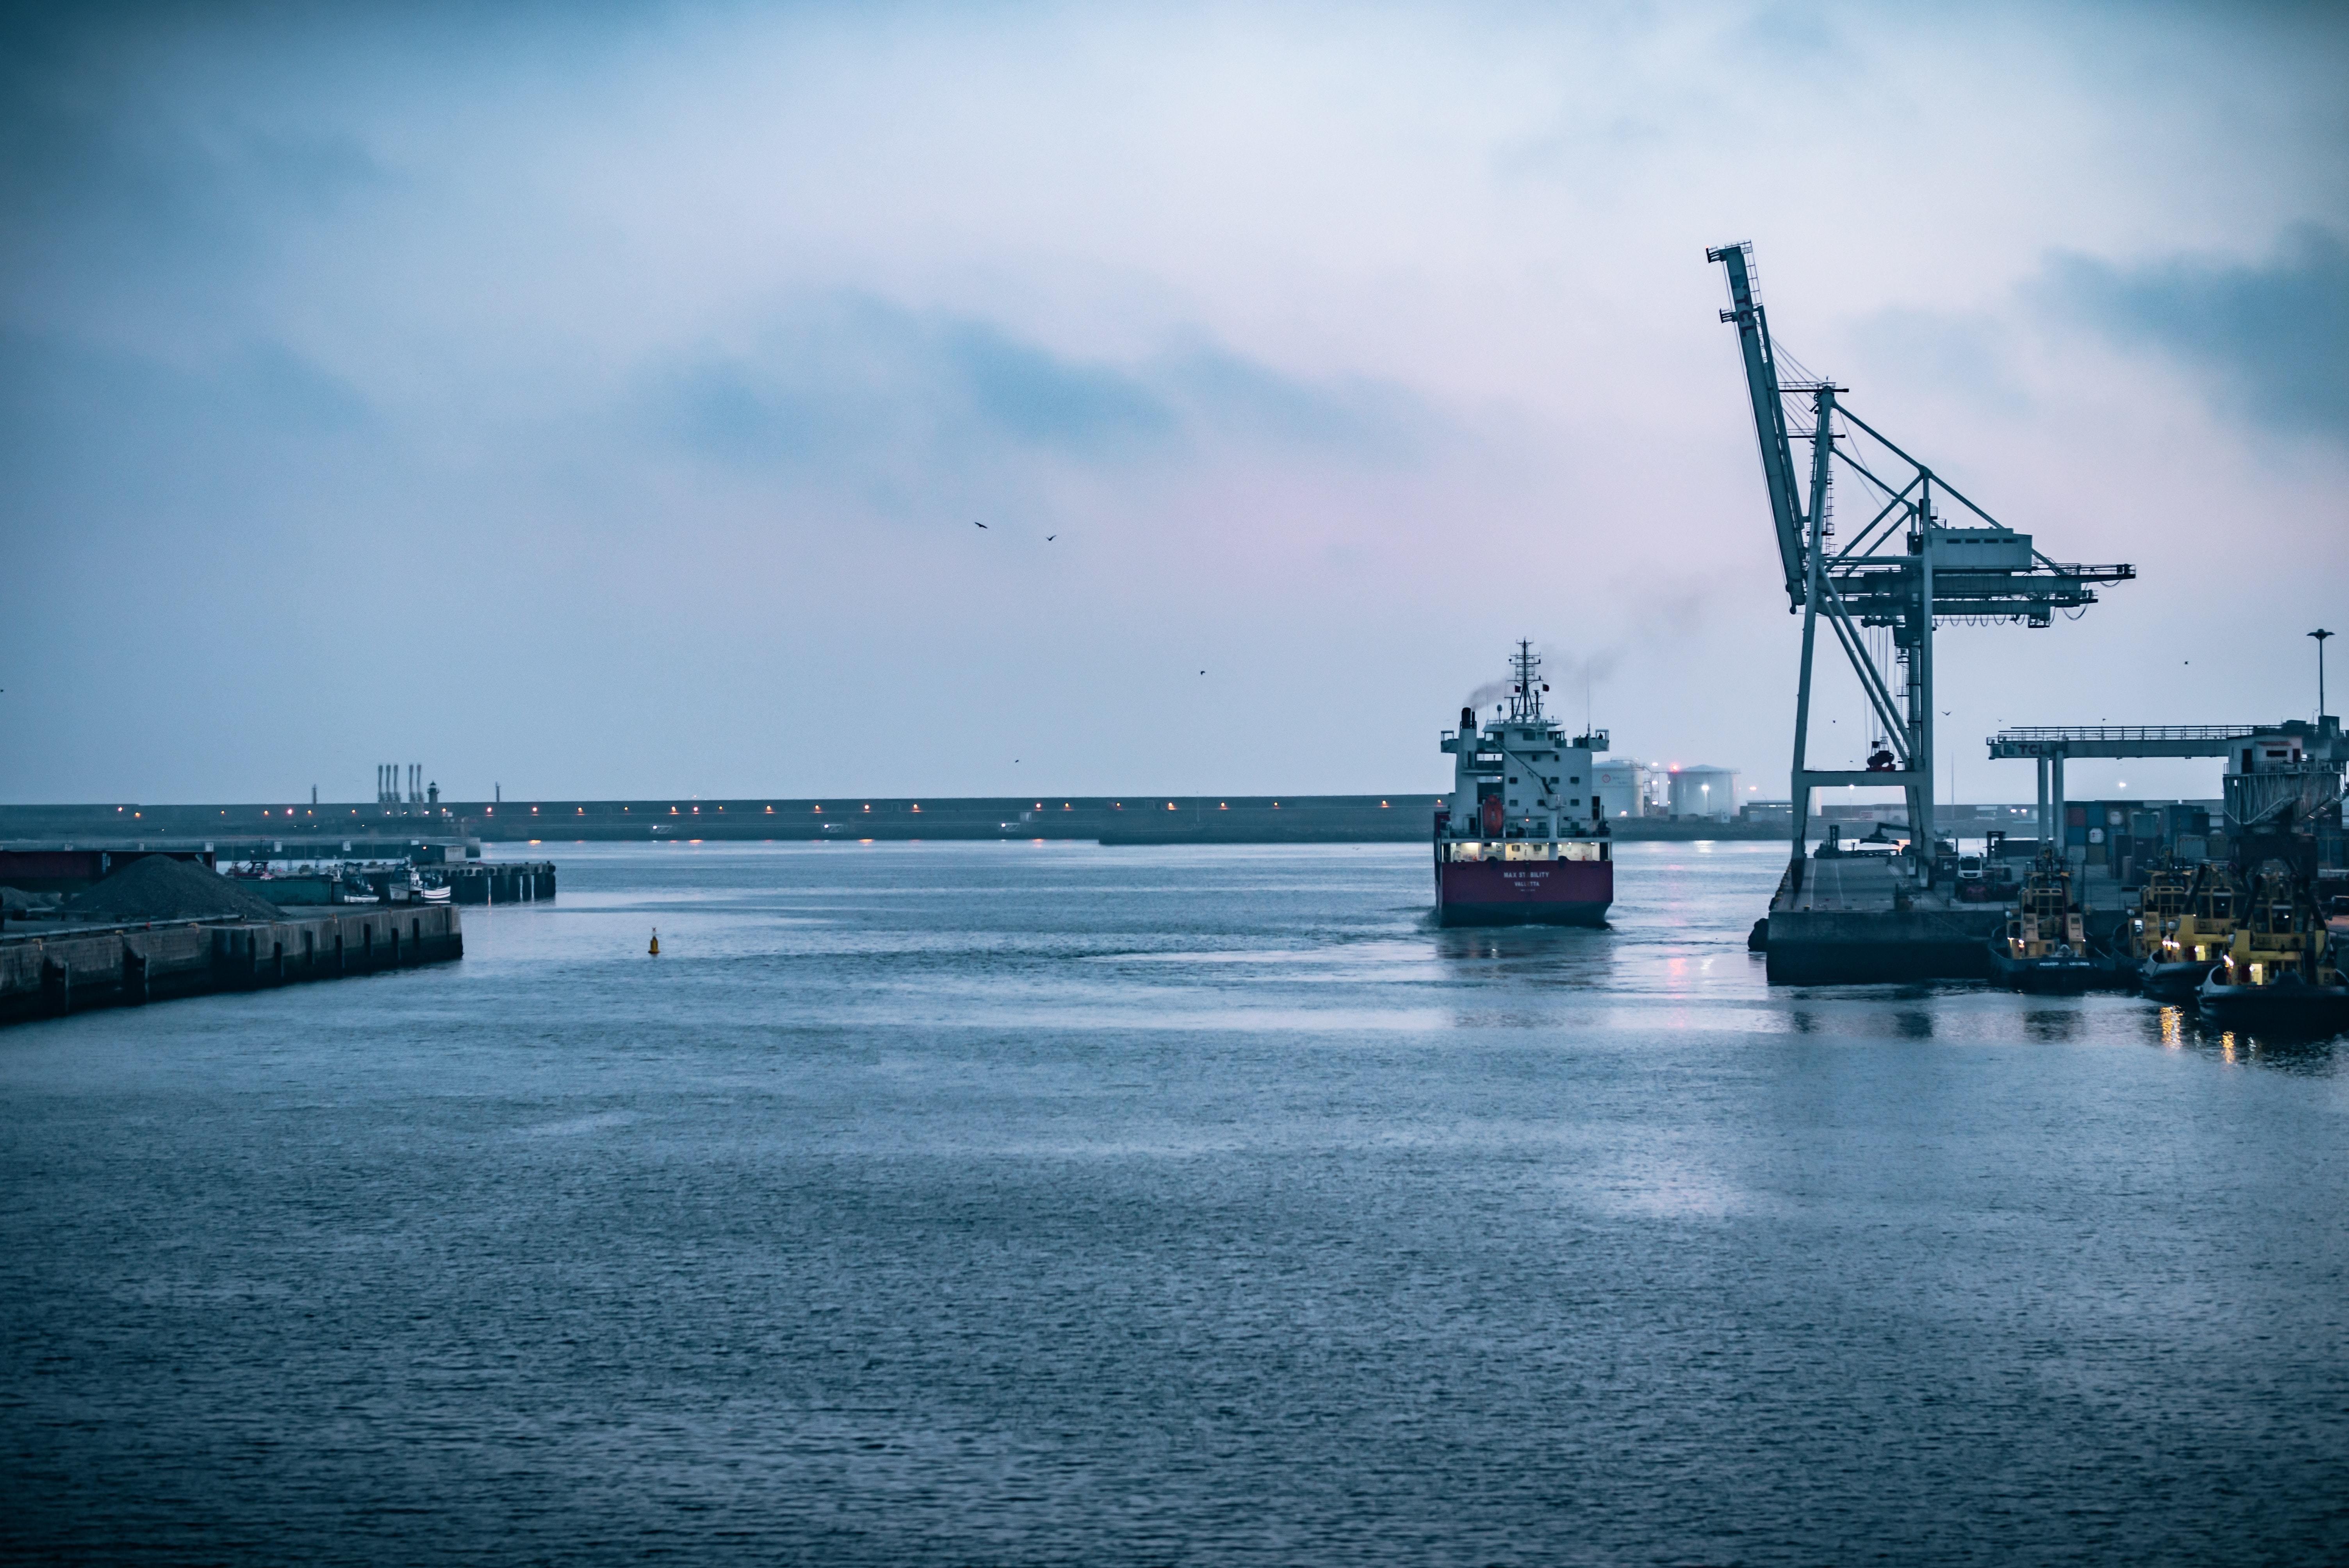 this is the sea trade port in Matosinhos, Porto